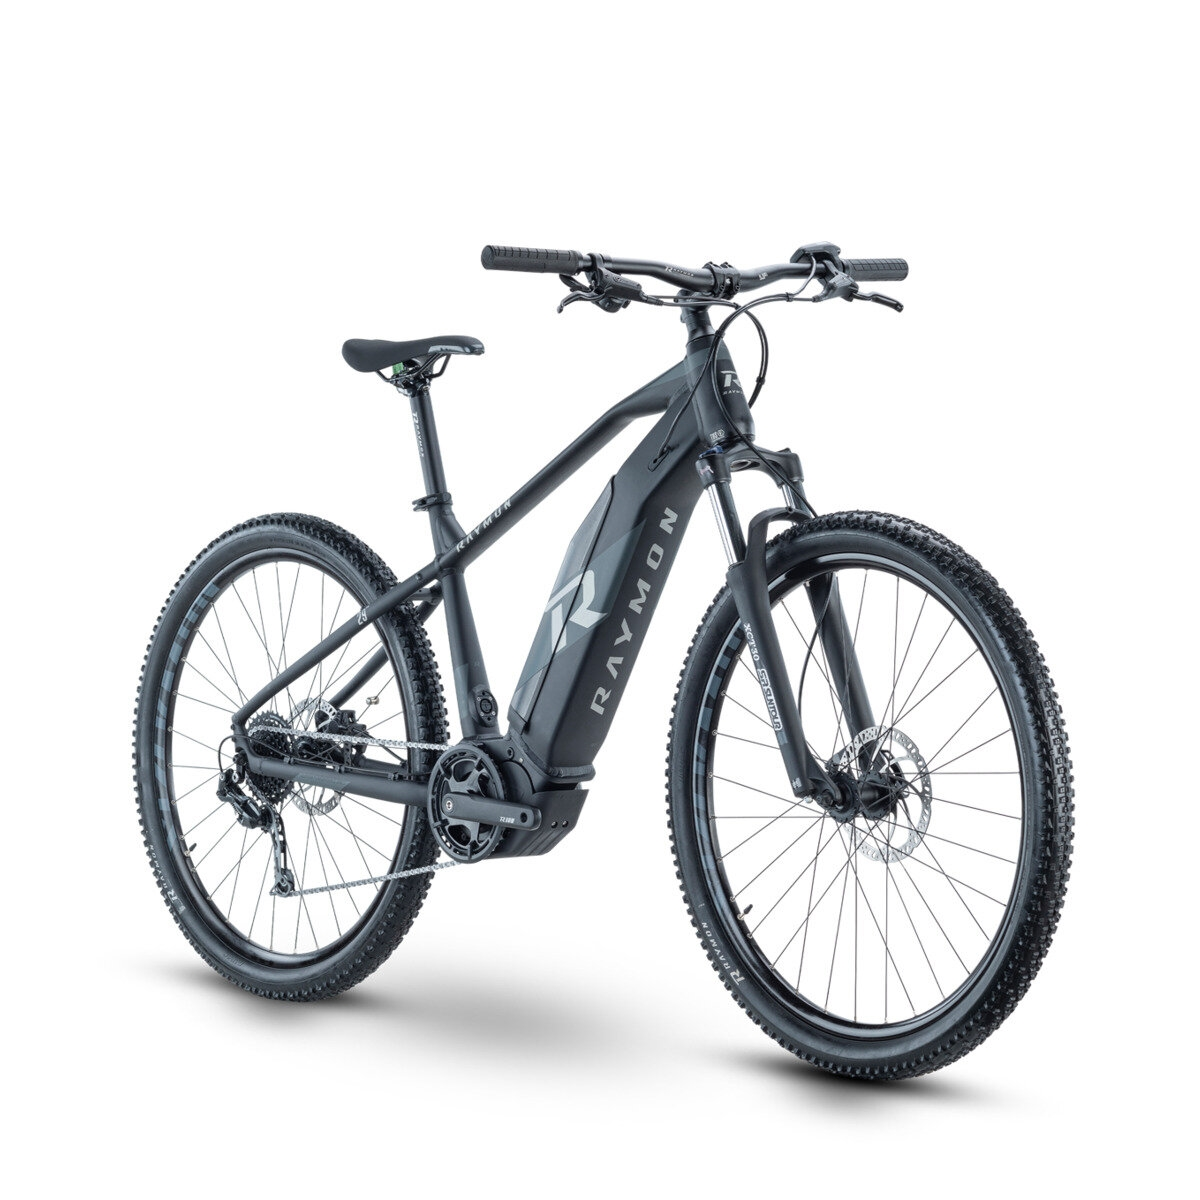 HardRay E-Nine 5.0 29'' 100mm 9s 500Wh Yamaha PW-ST Silver/Black 2021 Size 45